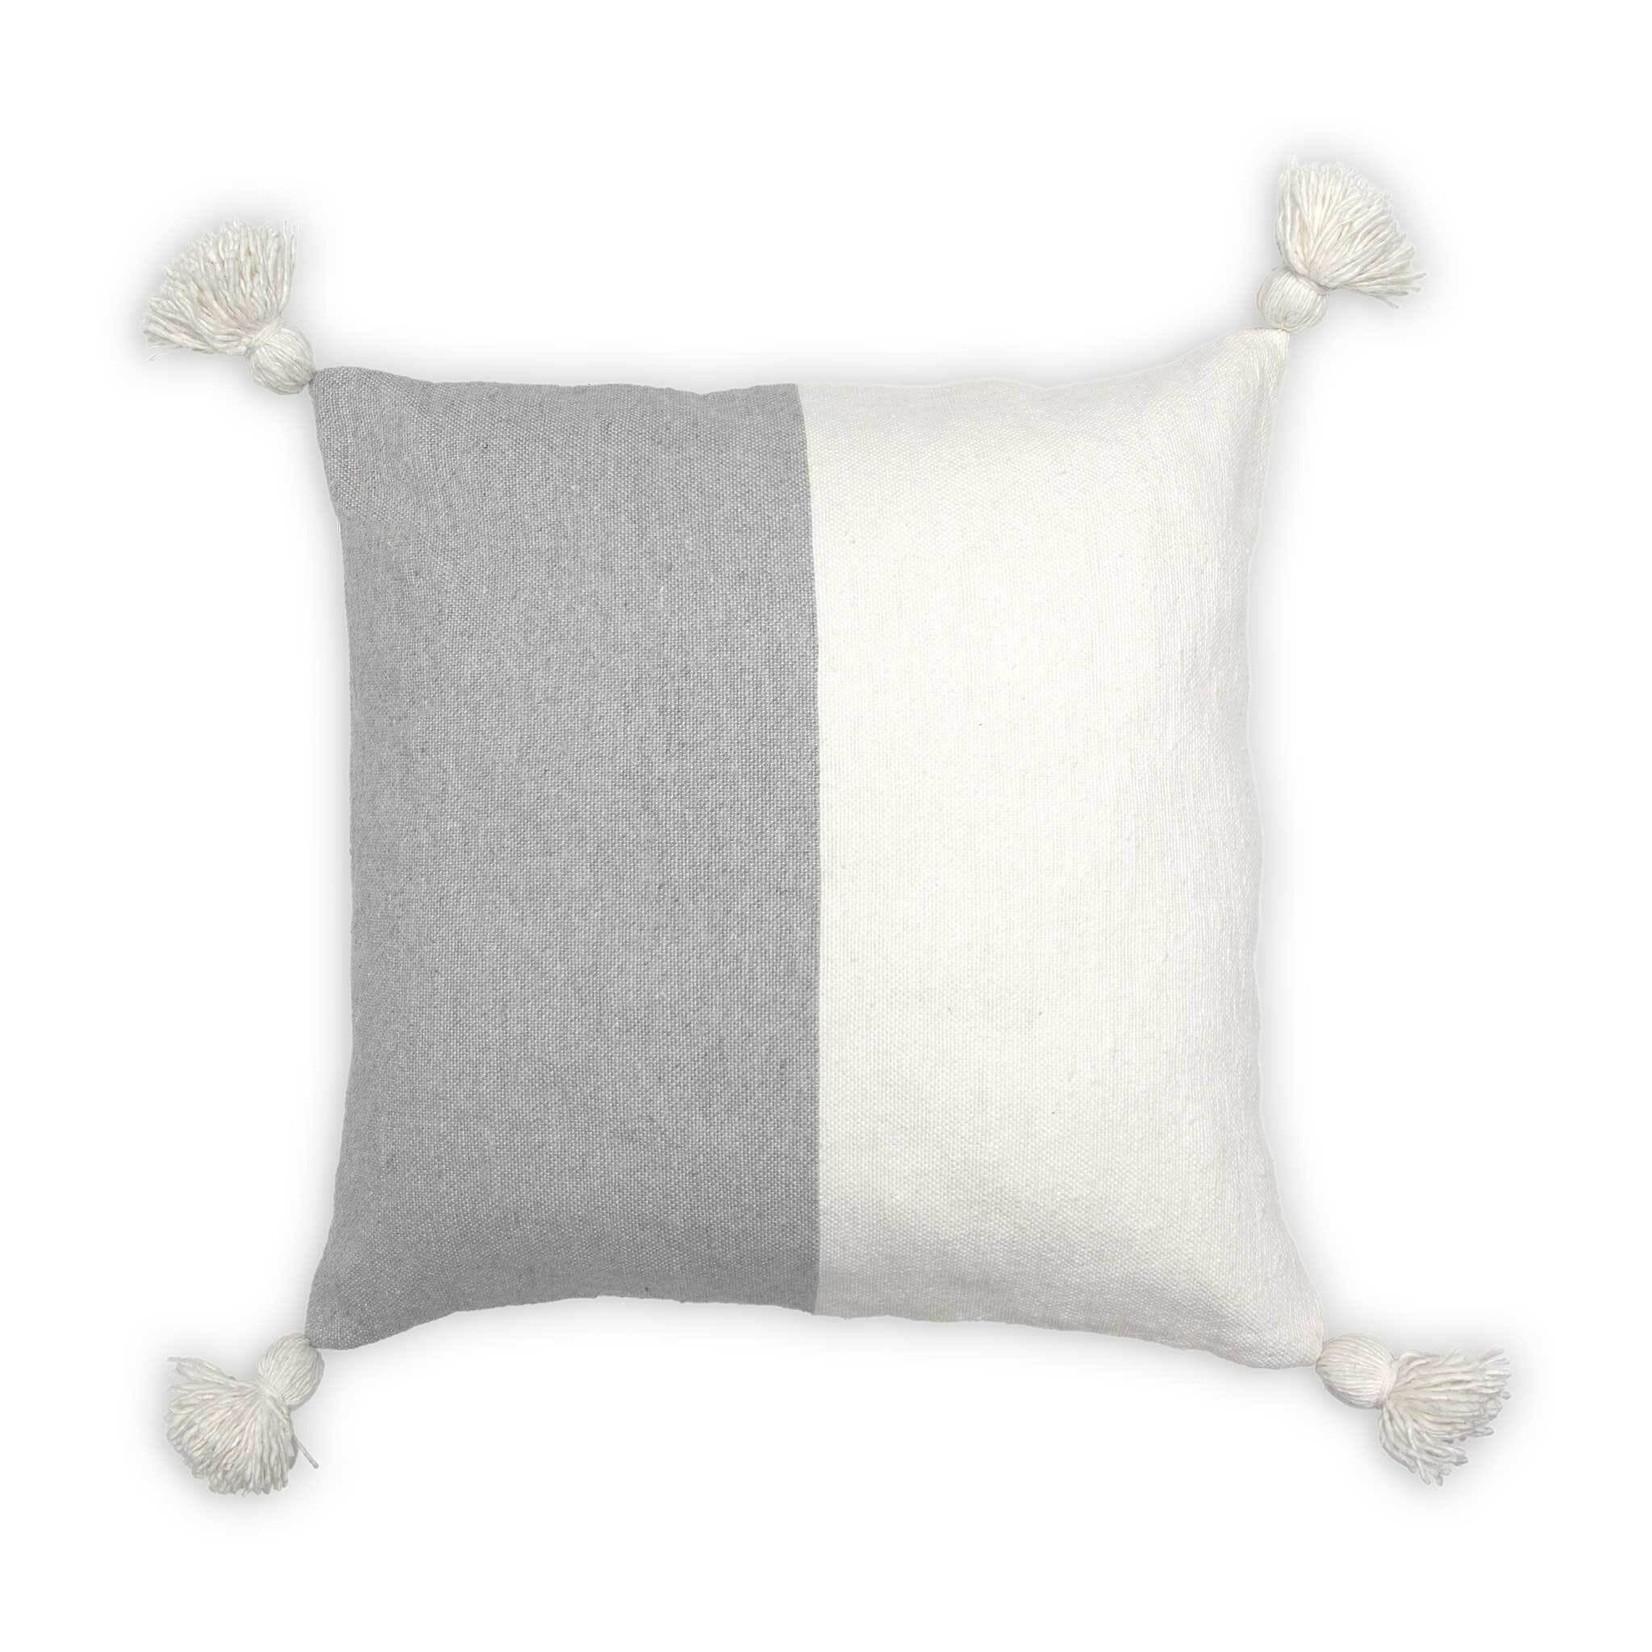 "Moroccan Pom Pom Pillow - 20""x20"" Half Light Grey"